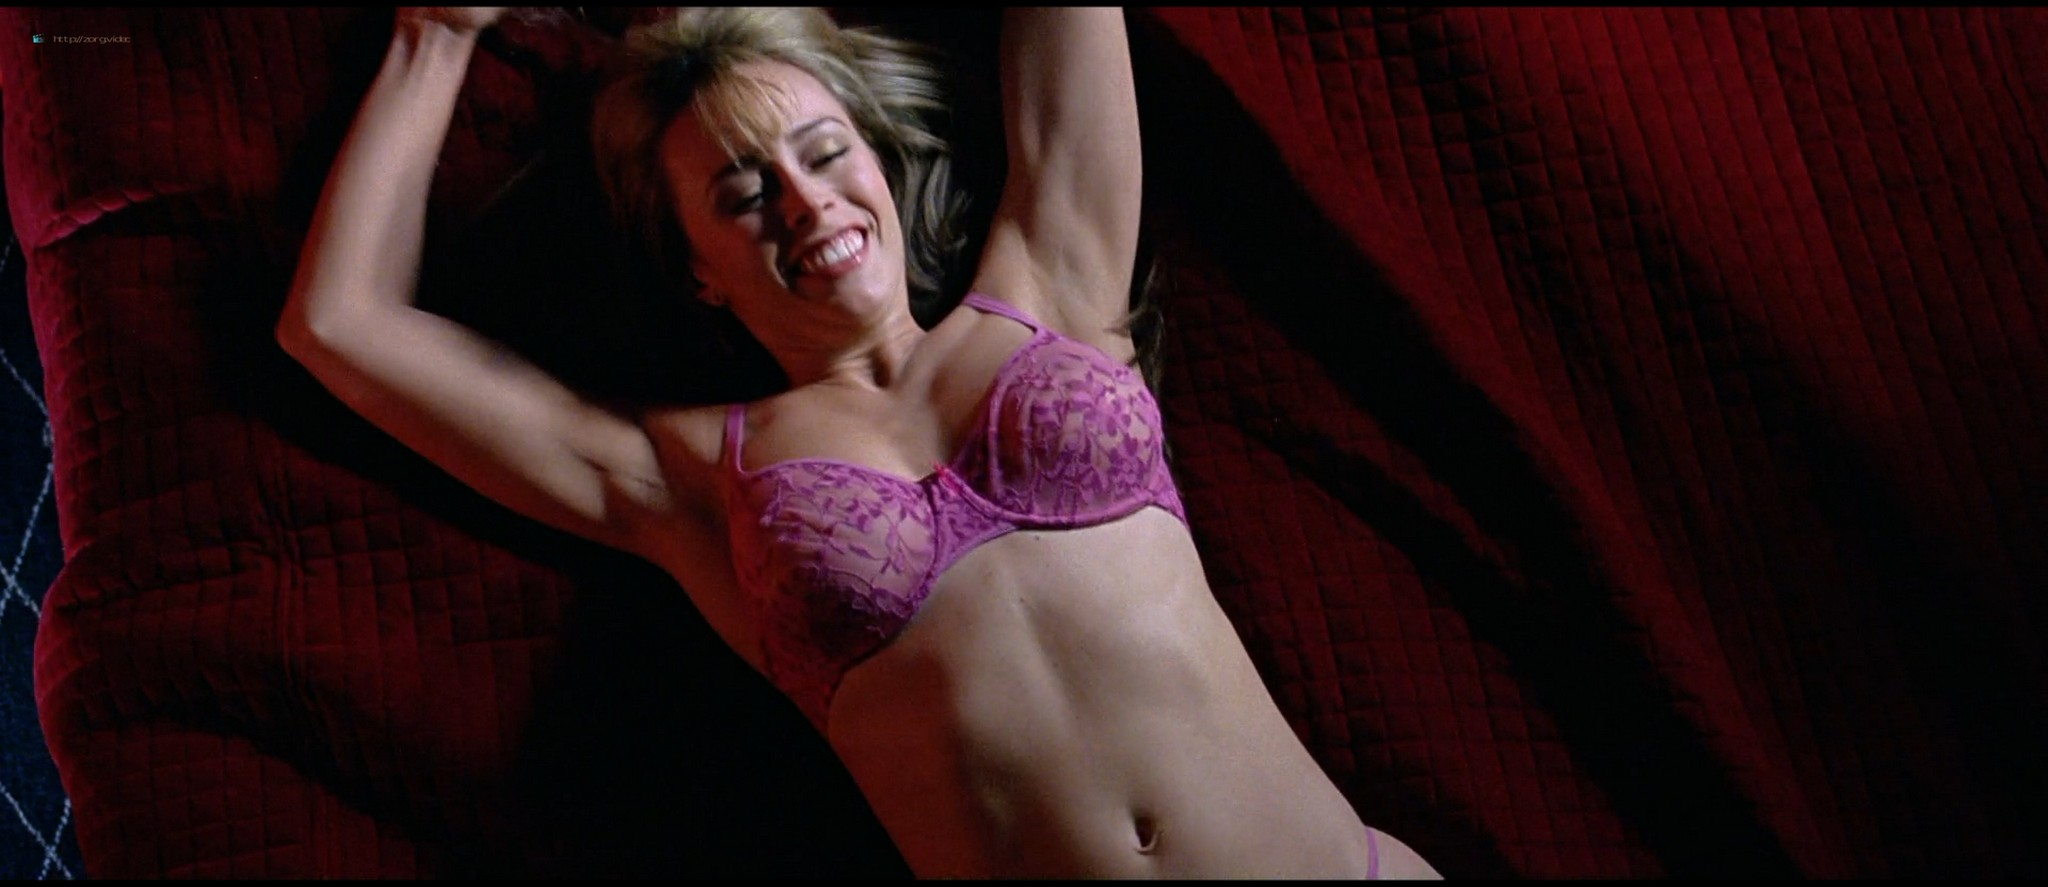 Diora Baird nude topless huge boobs others nude too - Wedding Crashers (2005) HD 1080p BluRay (15)